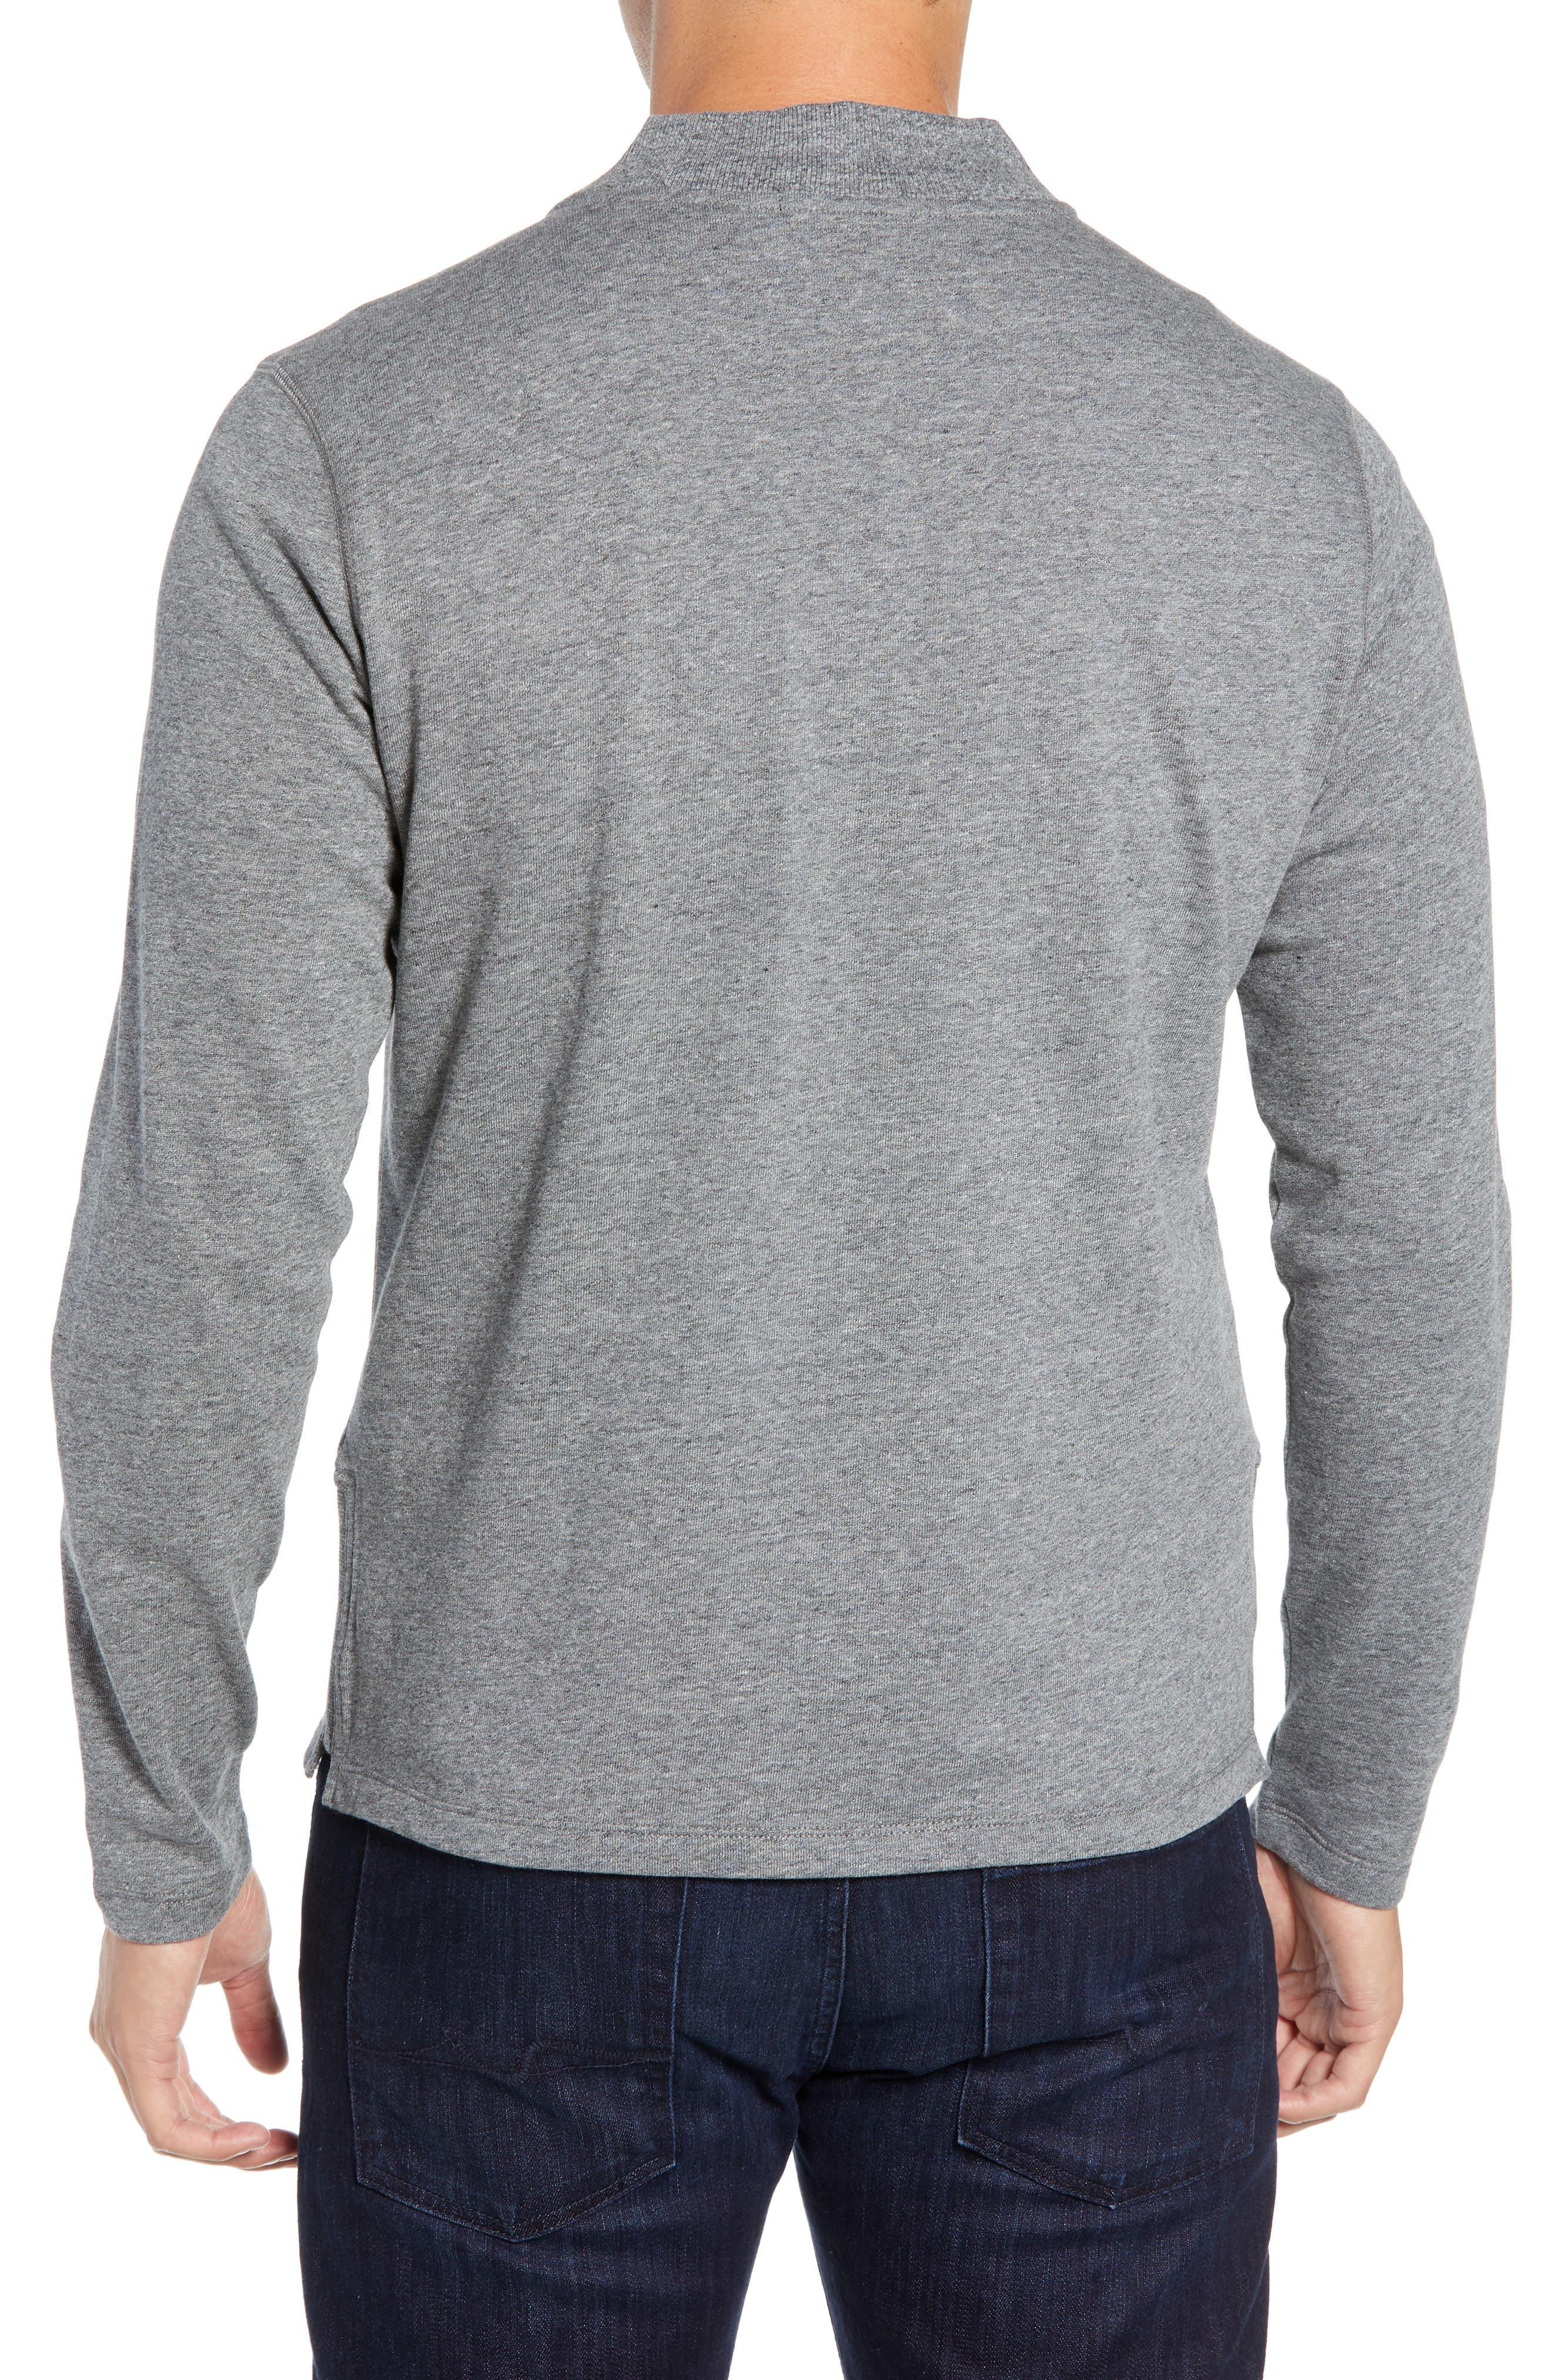 Carney Quarter Zip Sweatshirt,                             Alternate thumbnail 2, color,                             MID GREY